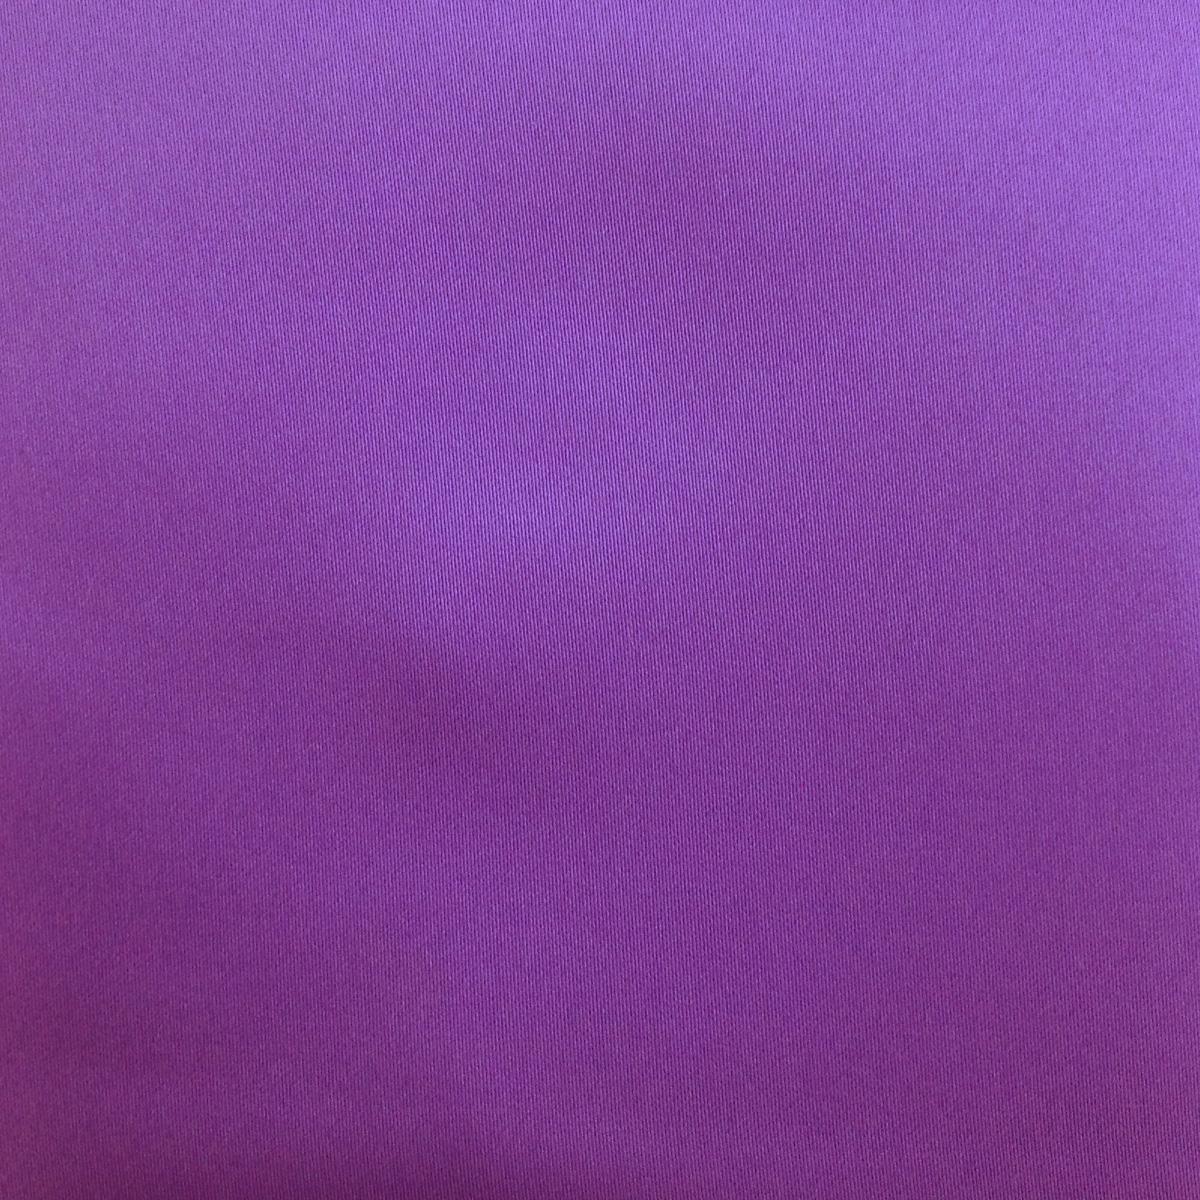 B1764 21 dark lilac mens ties facemasks con murphys menswear cork - - Con Murphys Menswear